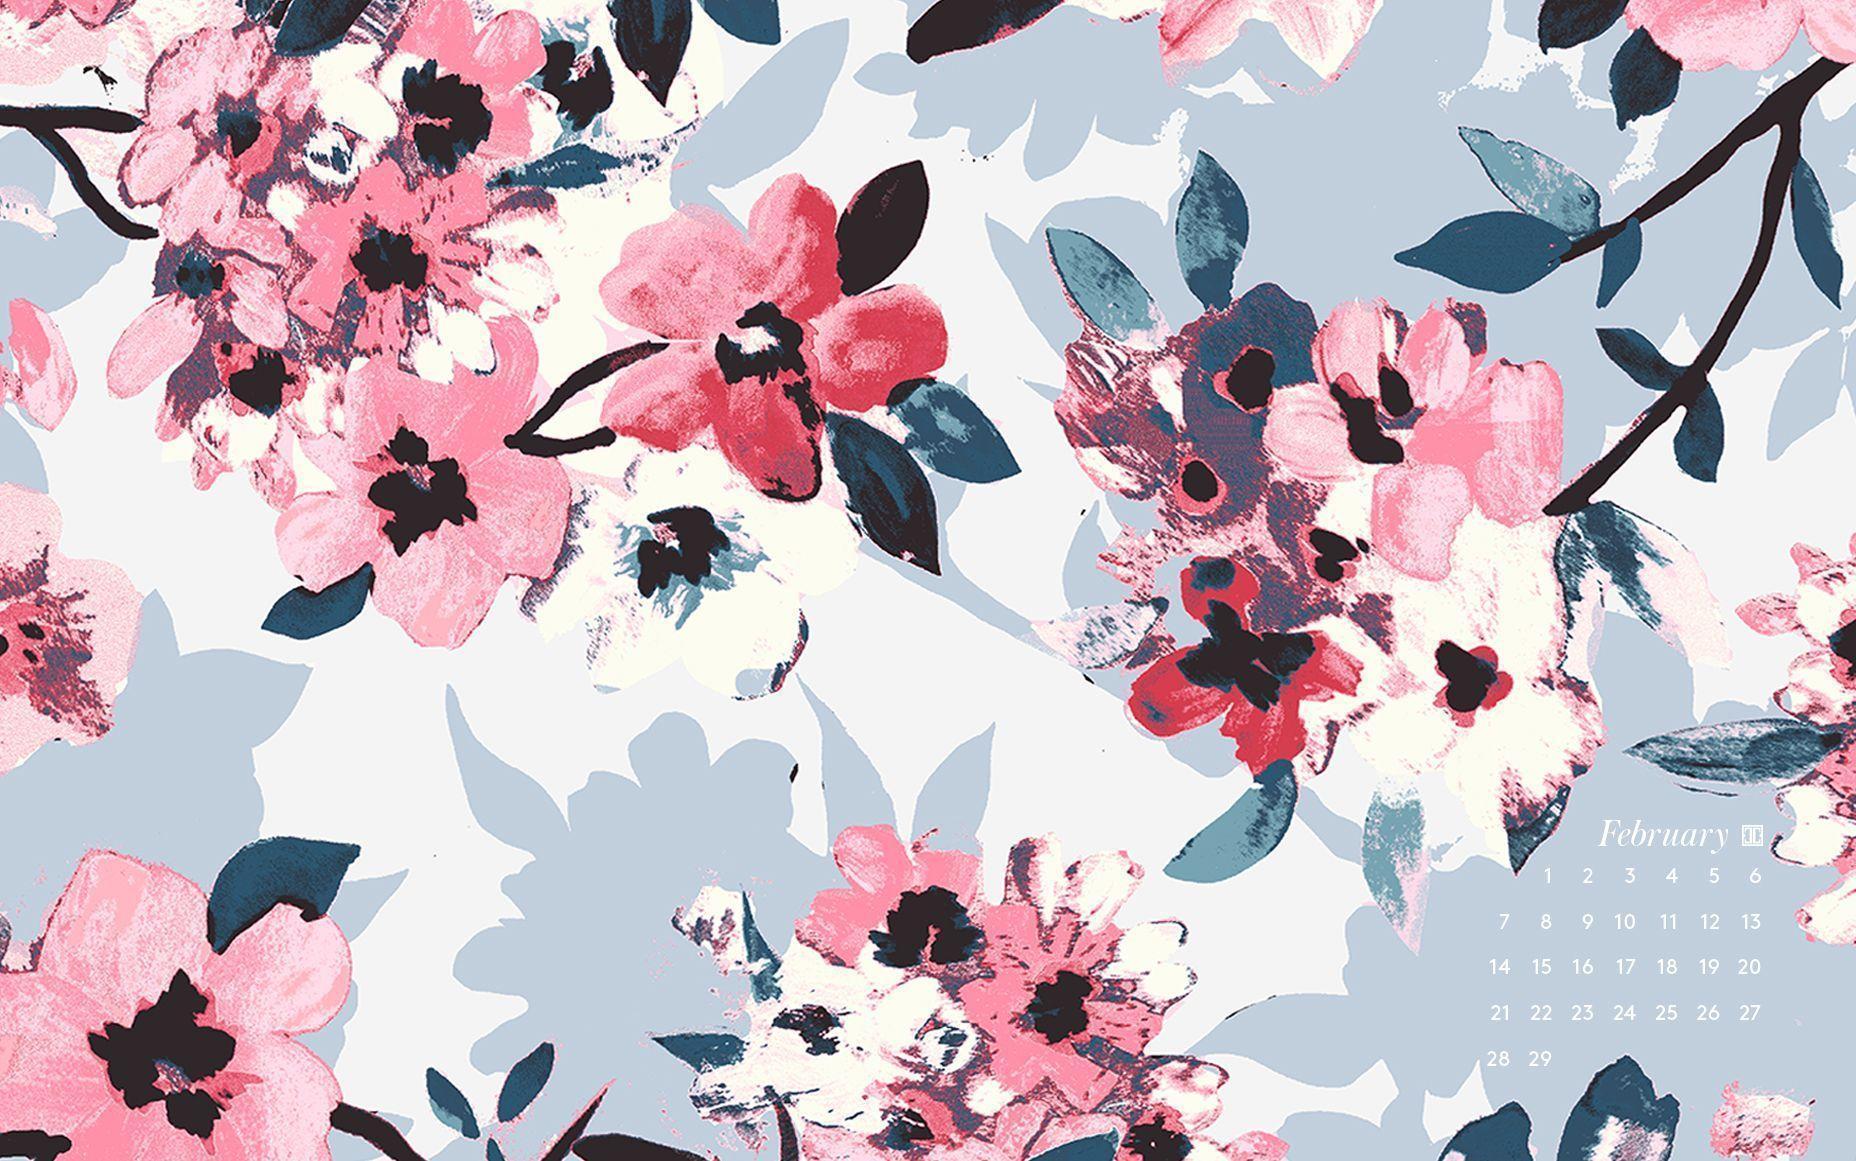 Iphone Collage Wallpaper Maker Desktop Wallpapers Calendar February 2016 Wallpaper Cave